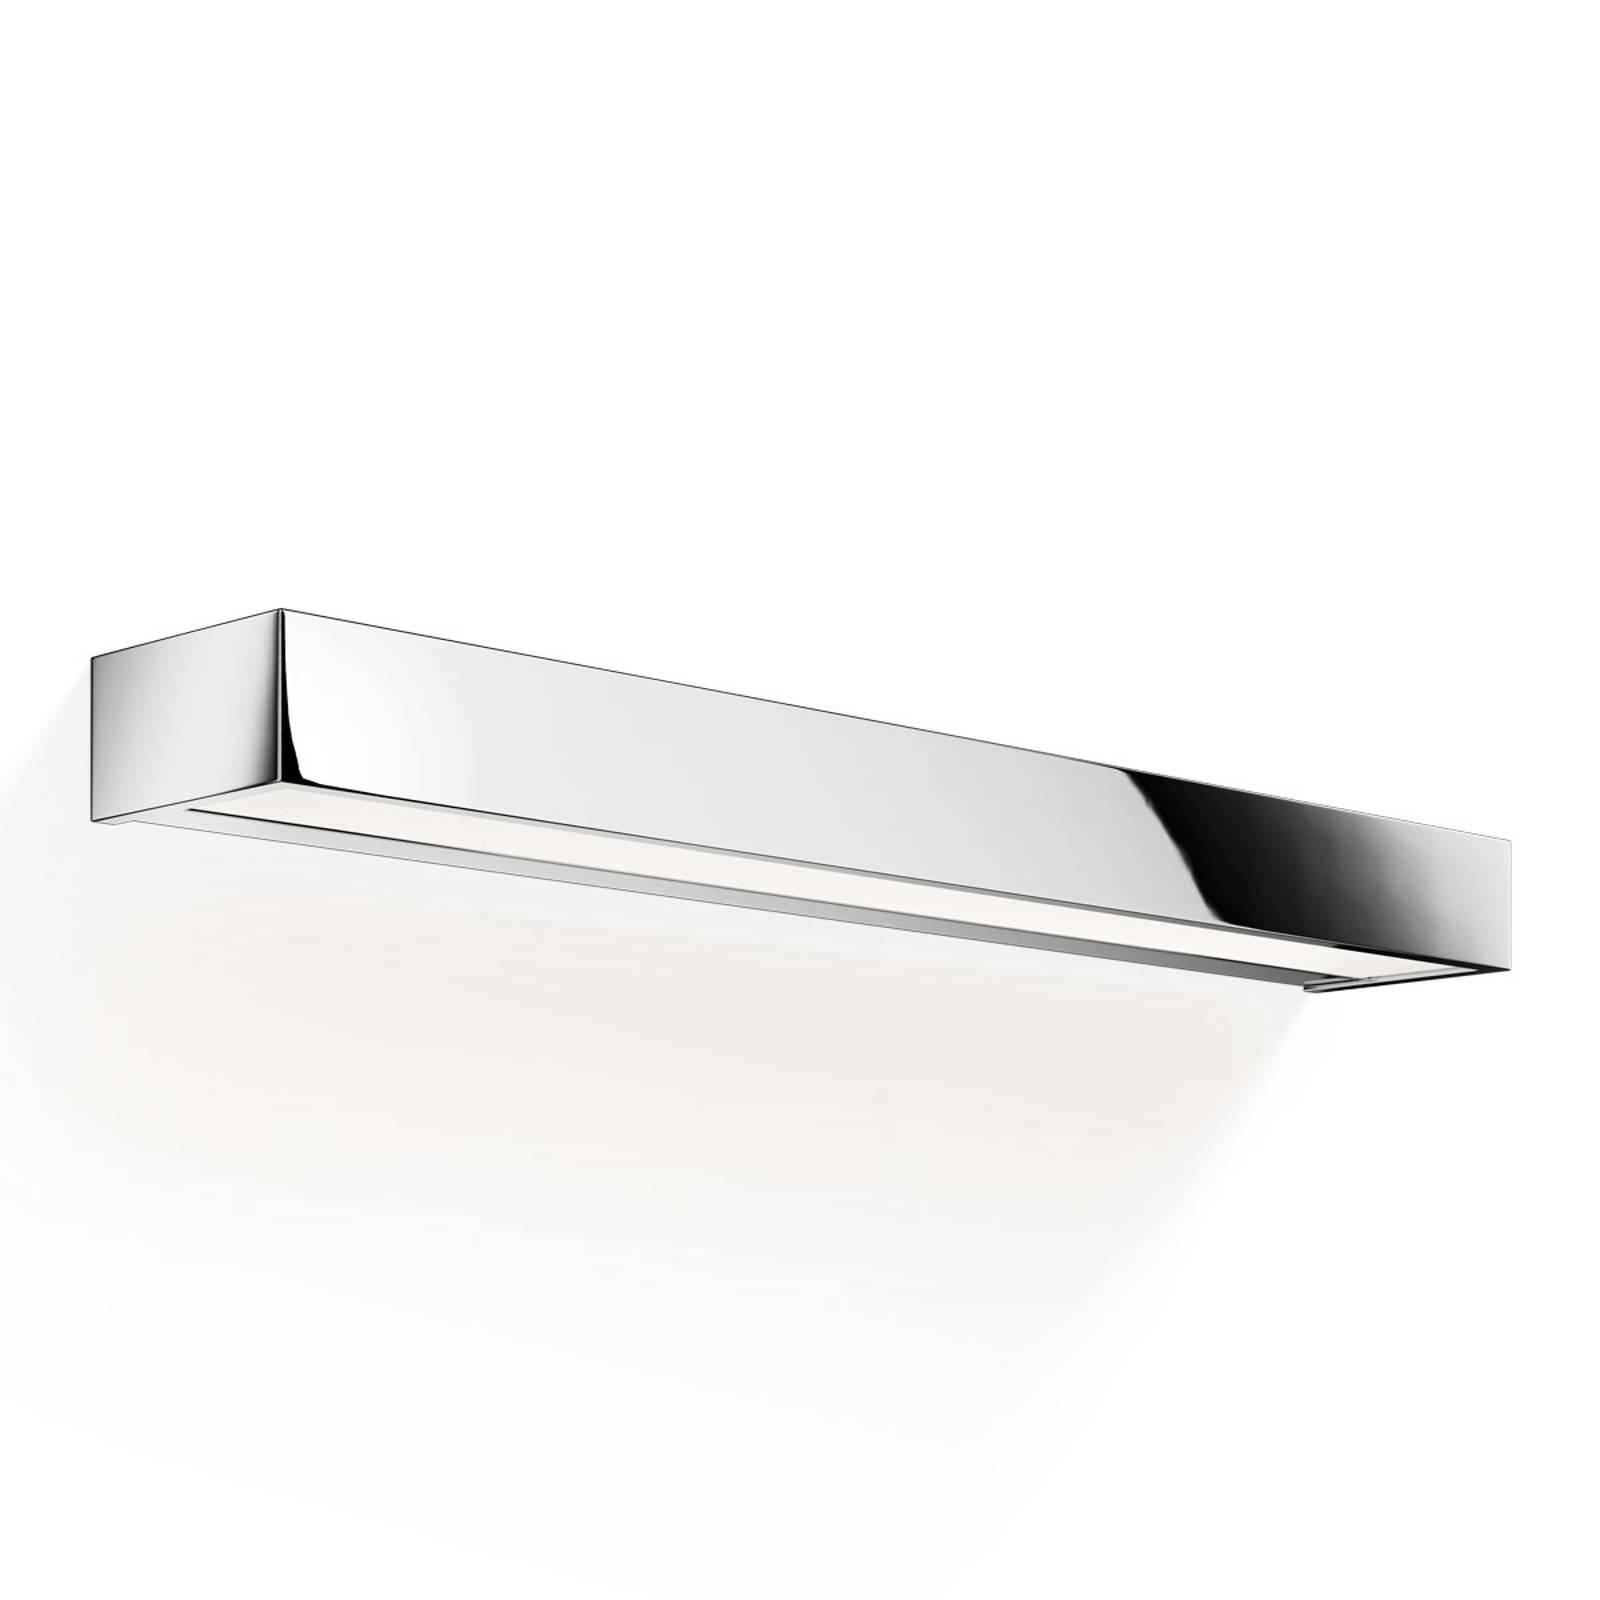 Decor Walther Box 60 N LED wandlamp 3.000 K